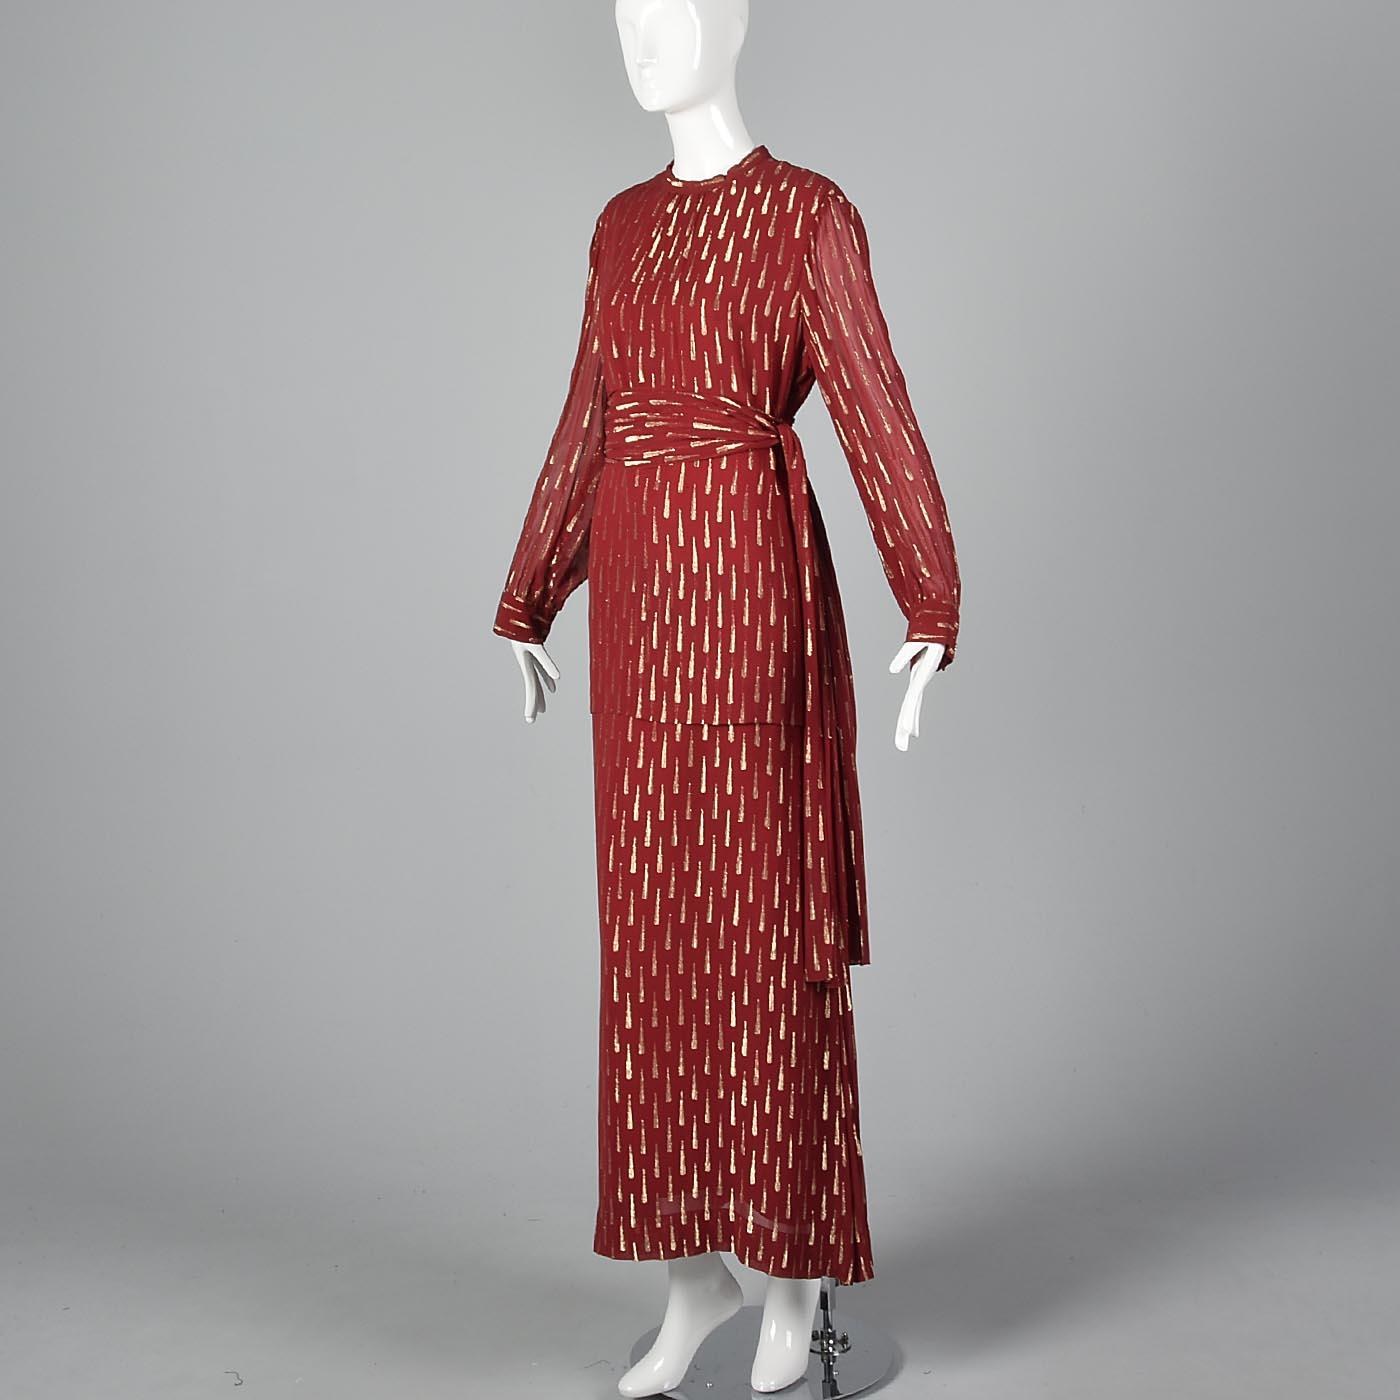 Adele Simpson Elegant Evening Gown Romantic Formal Dress Loose Flowy ...